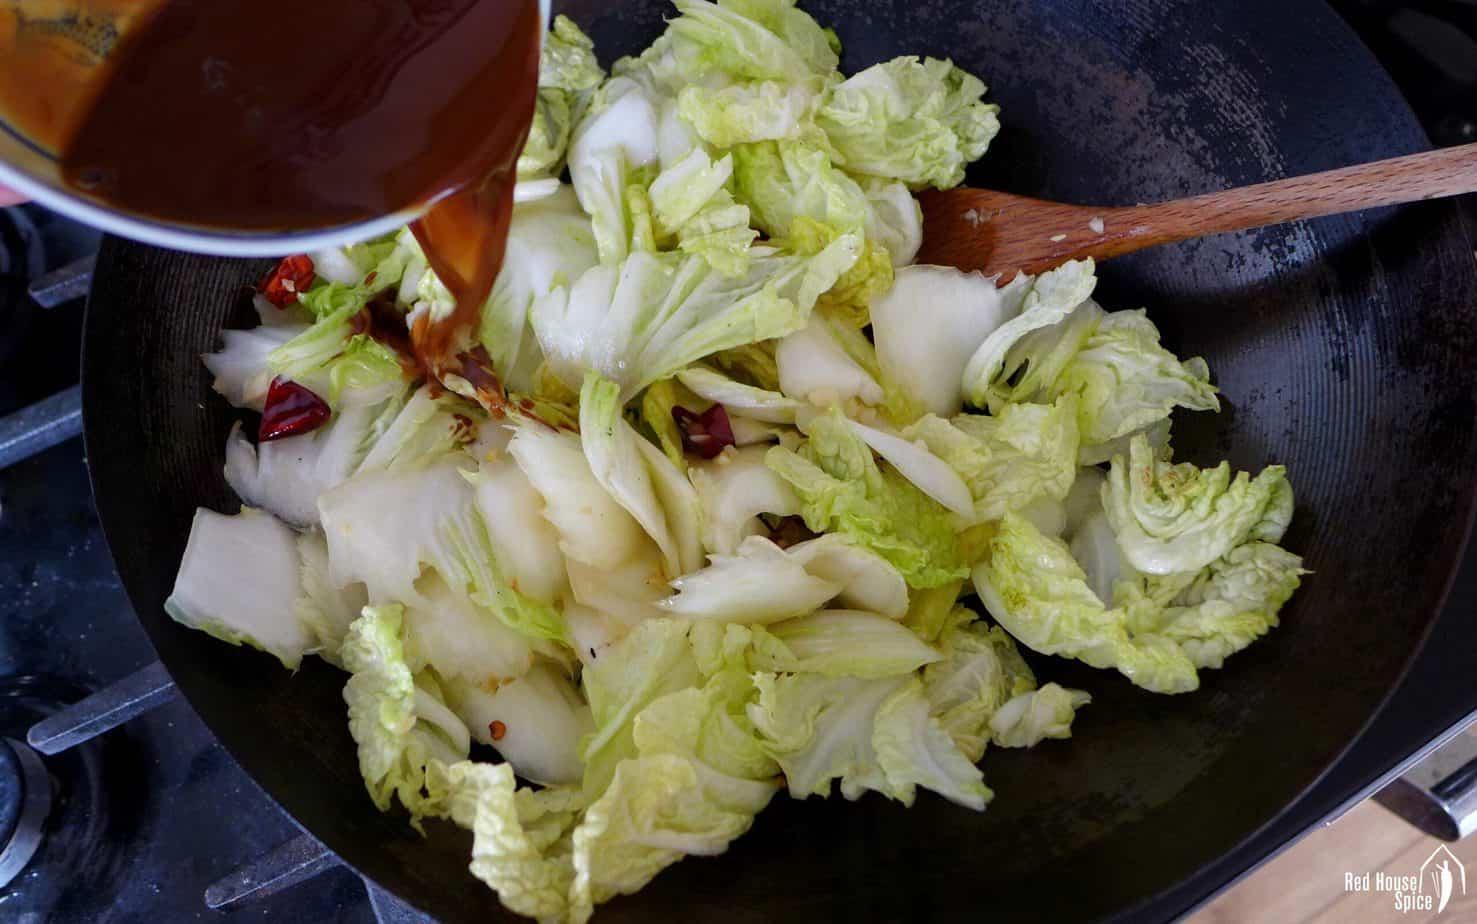 Pouring sauce onto stir-fried napa cabbage